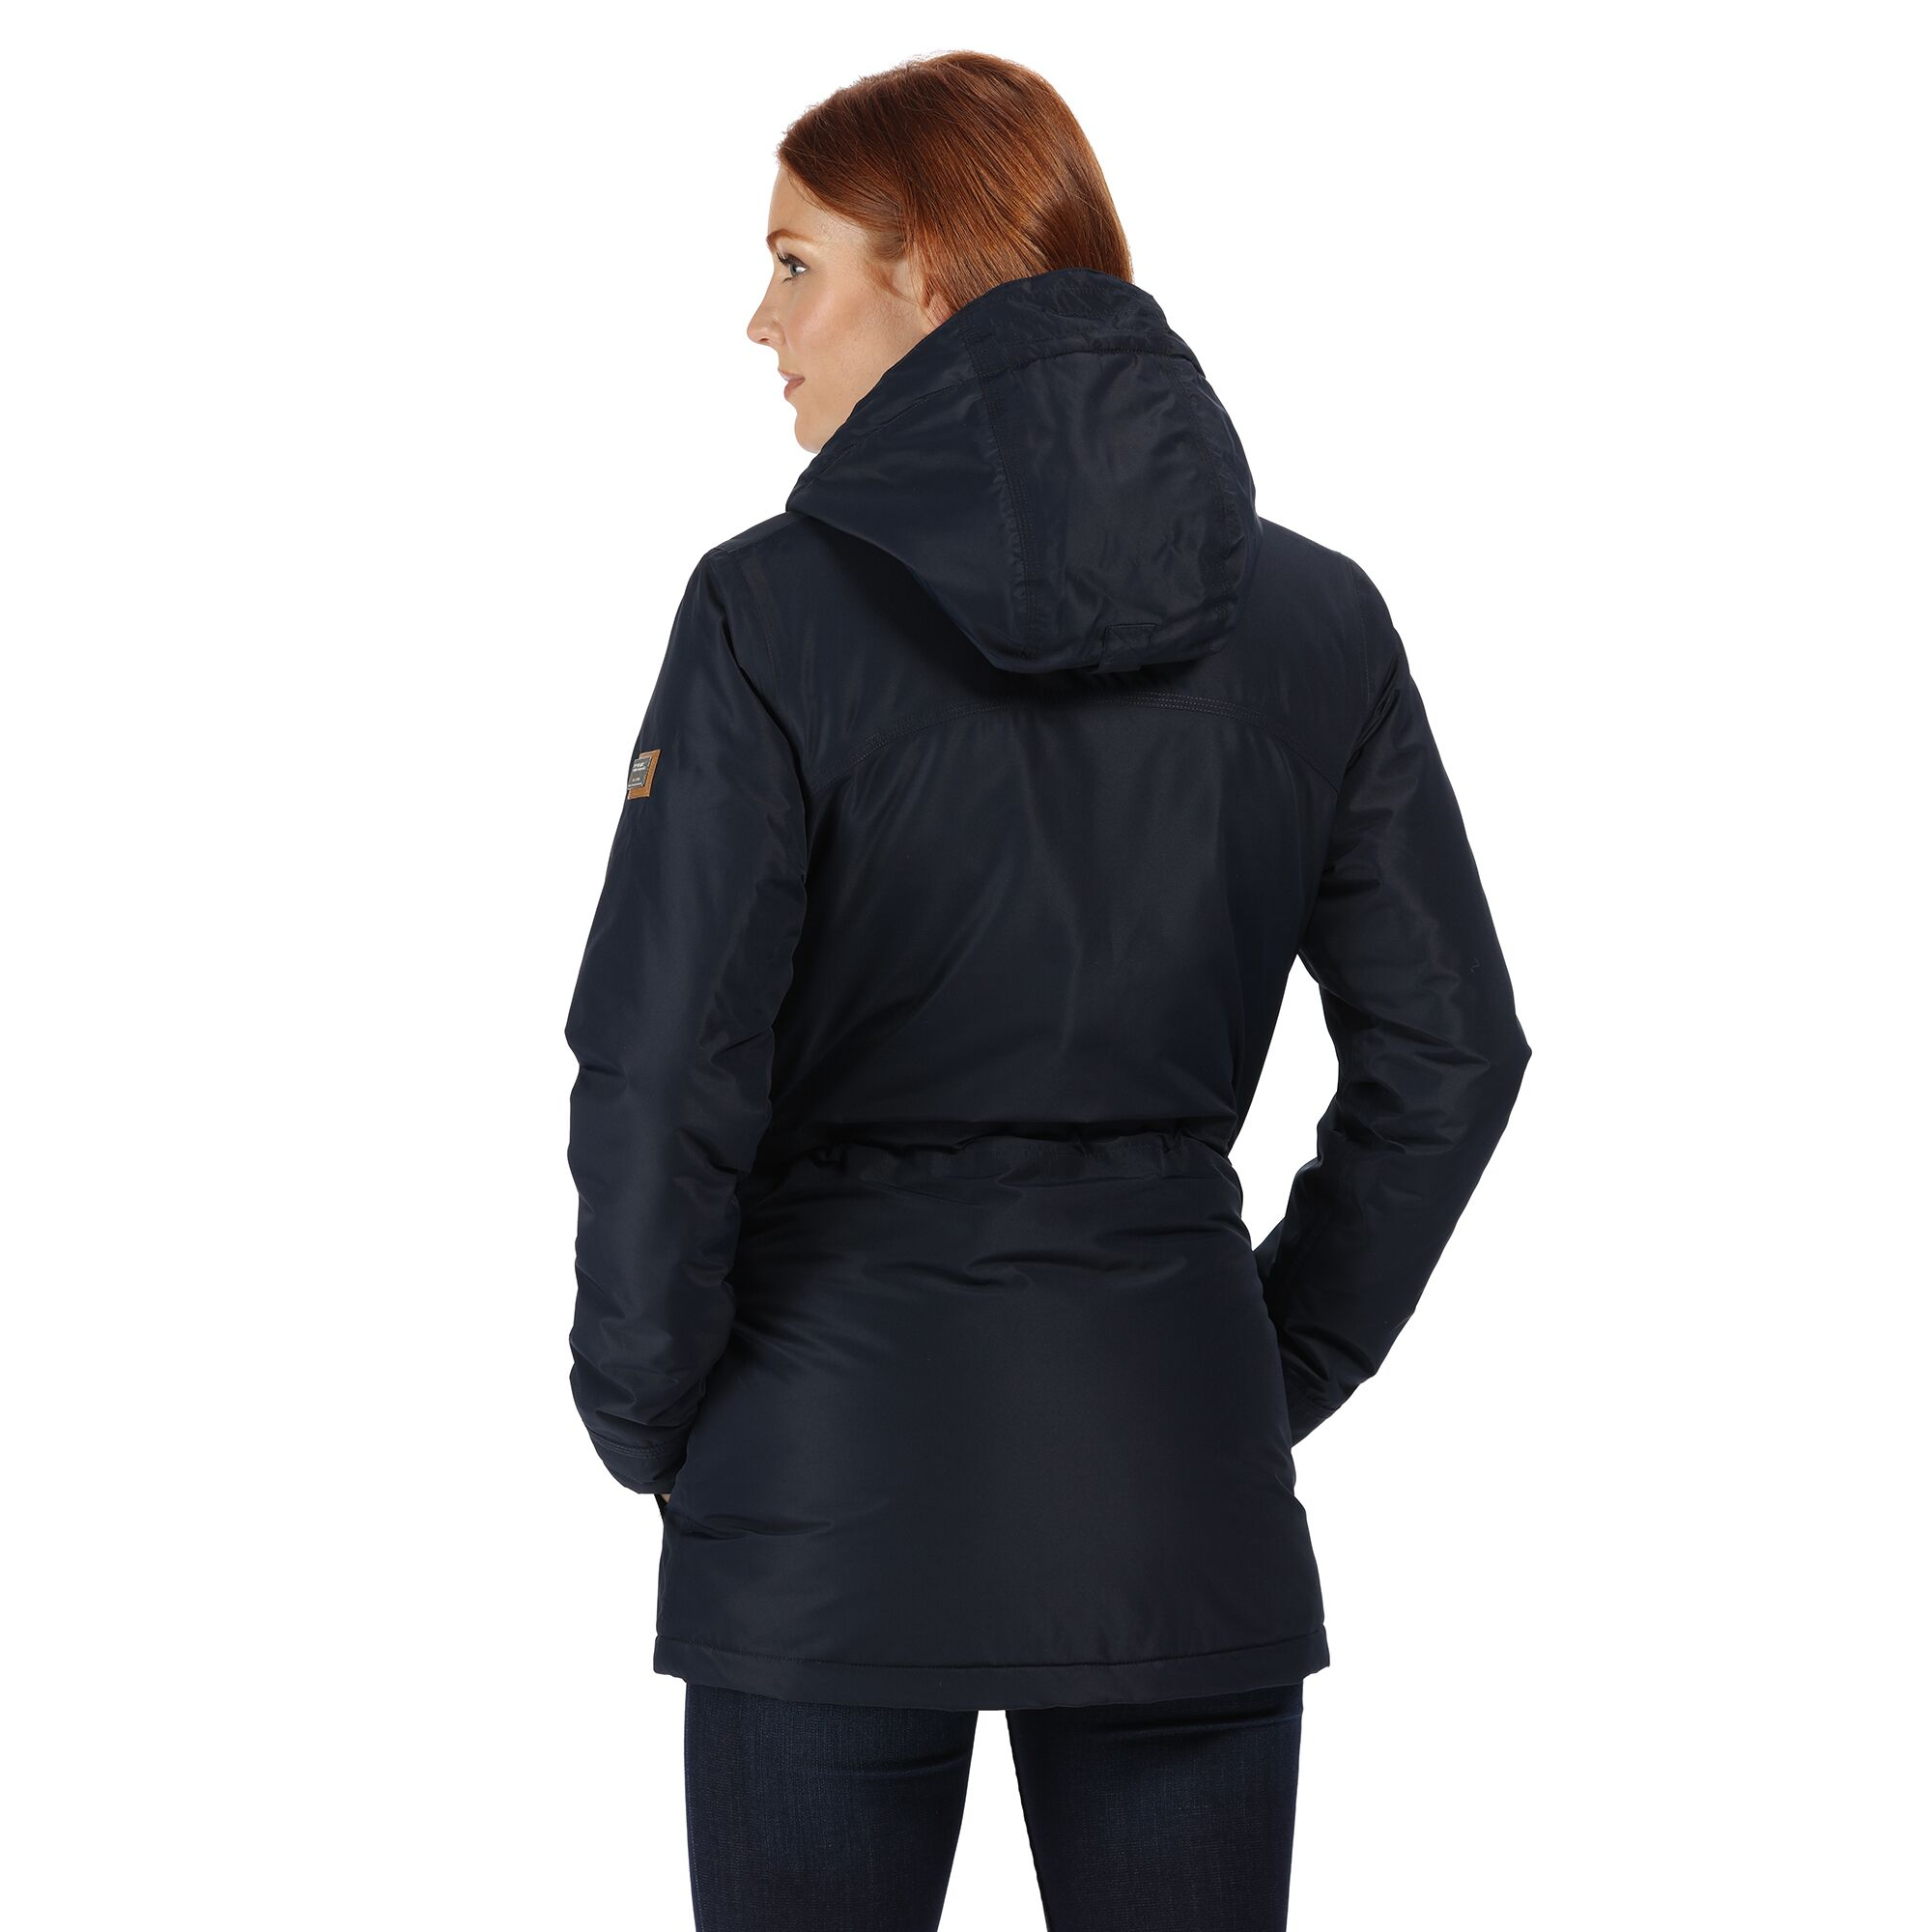 Regatta-Womens-Ladies-Braelynn-Long-Length-Waterproof-Jacket-RG4552 thumbnail 21